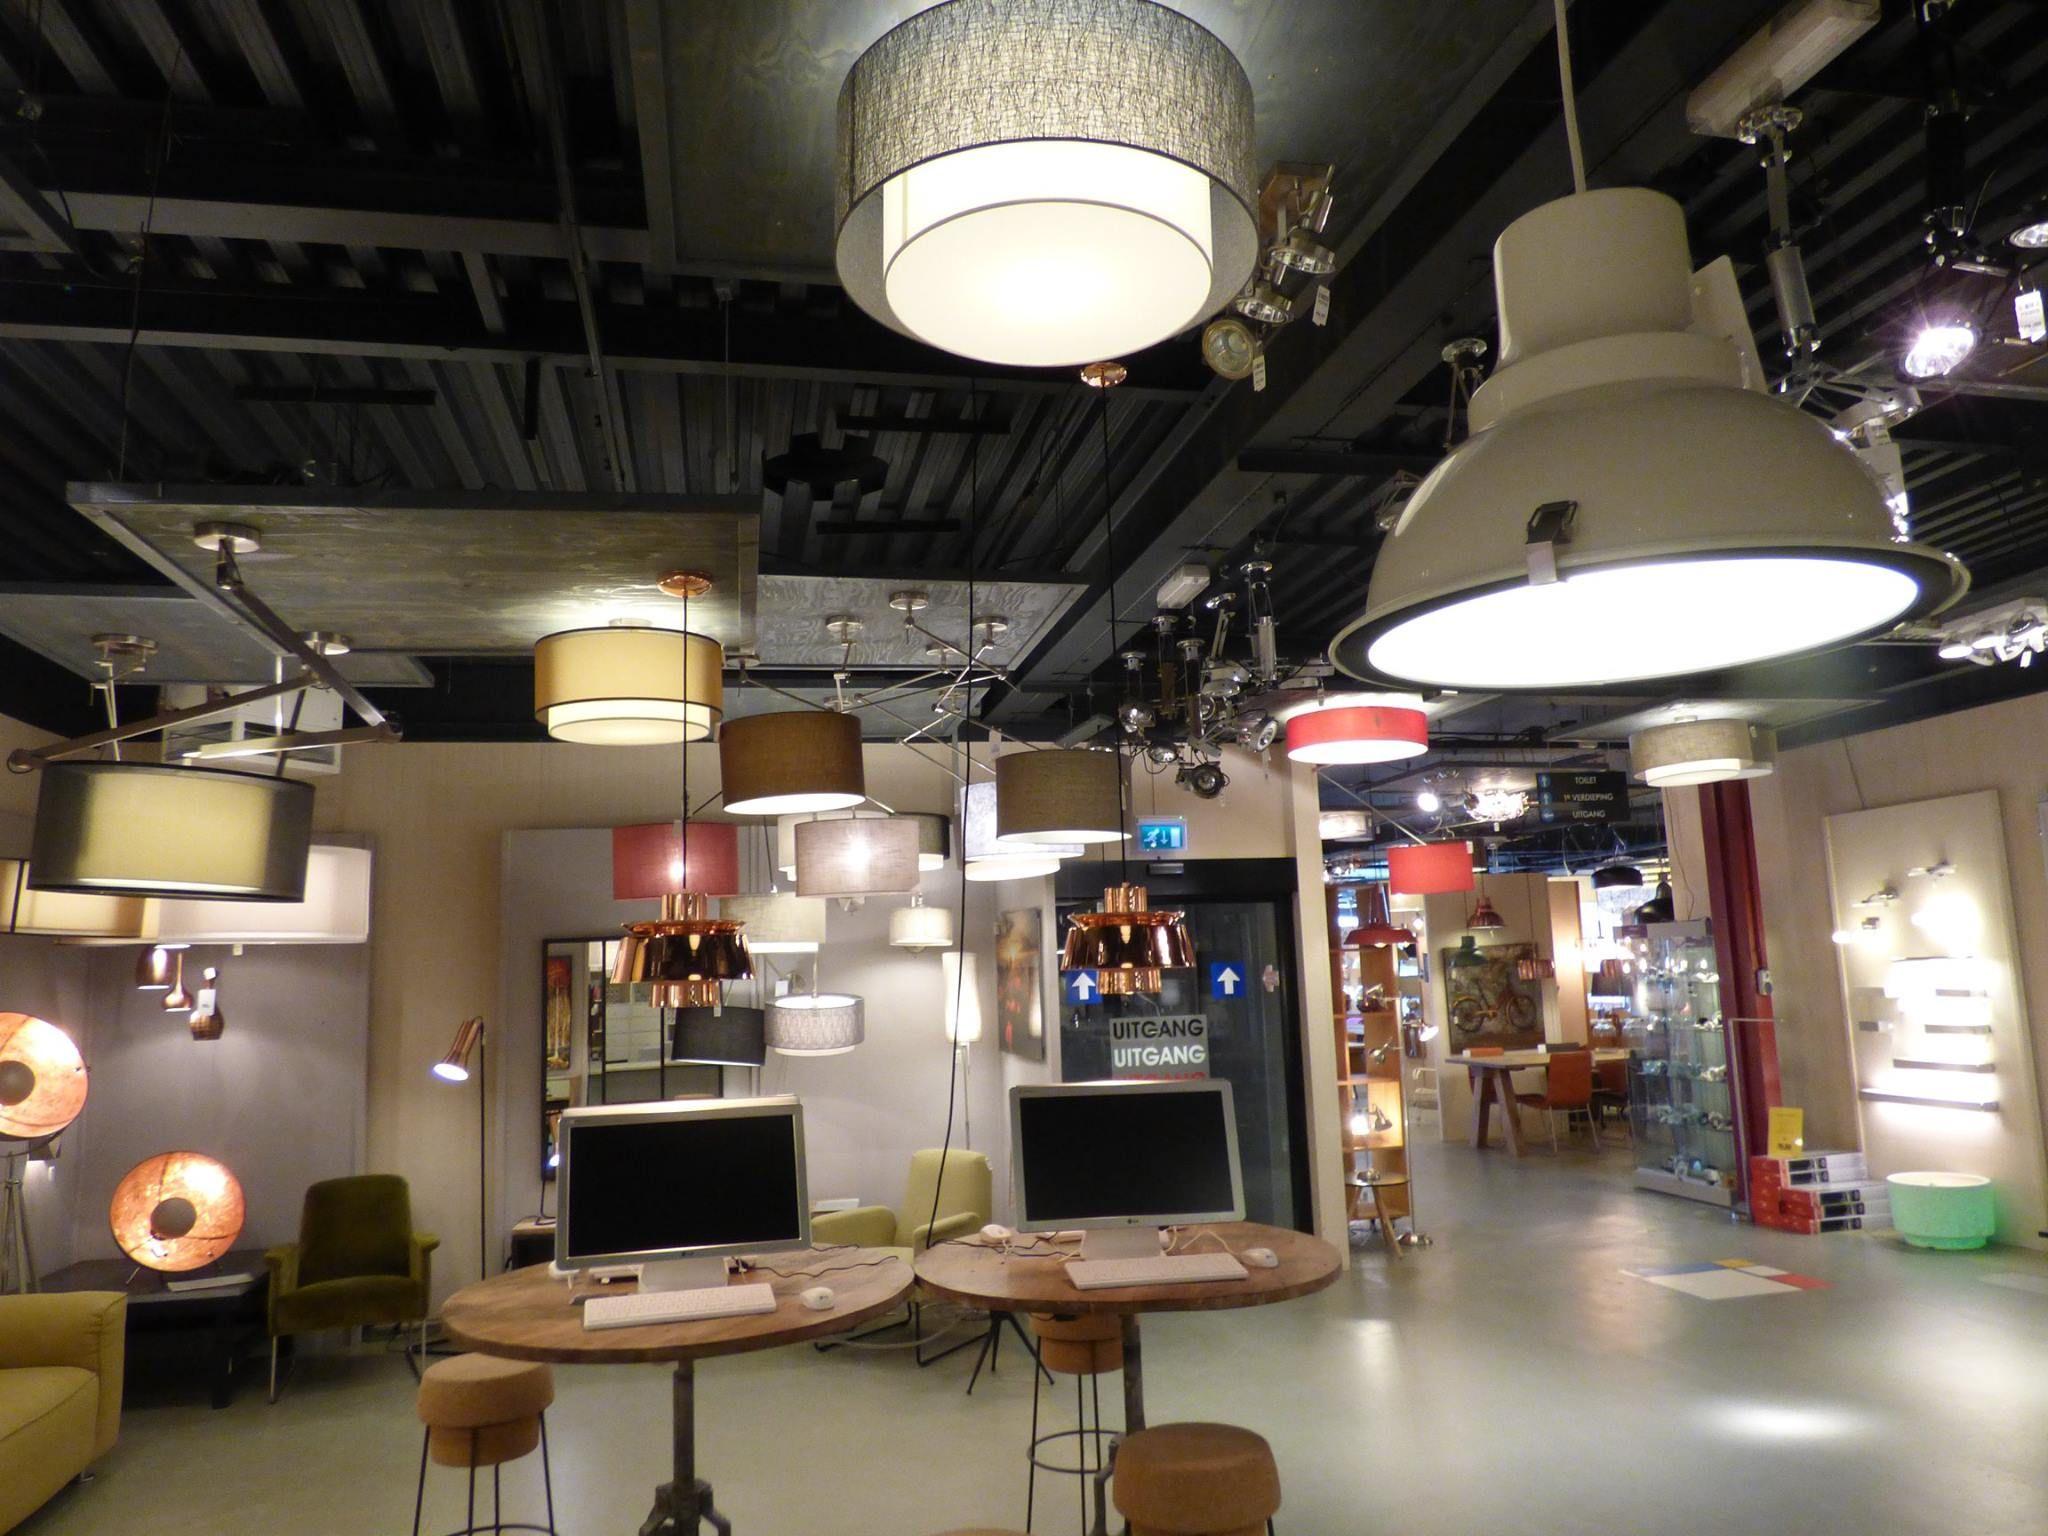 Iluminaci n showroom tienda interior l mparas for Lamparas de pared interior